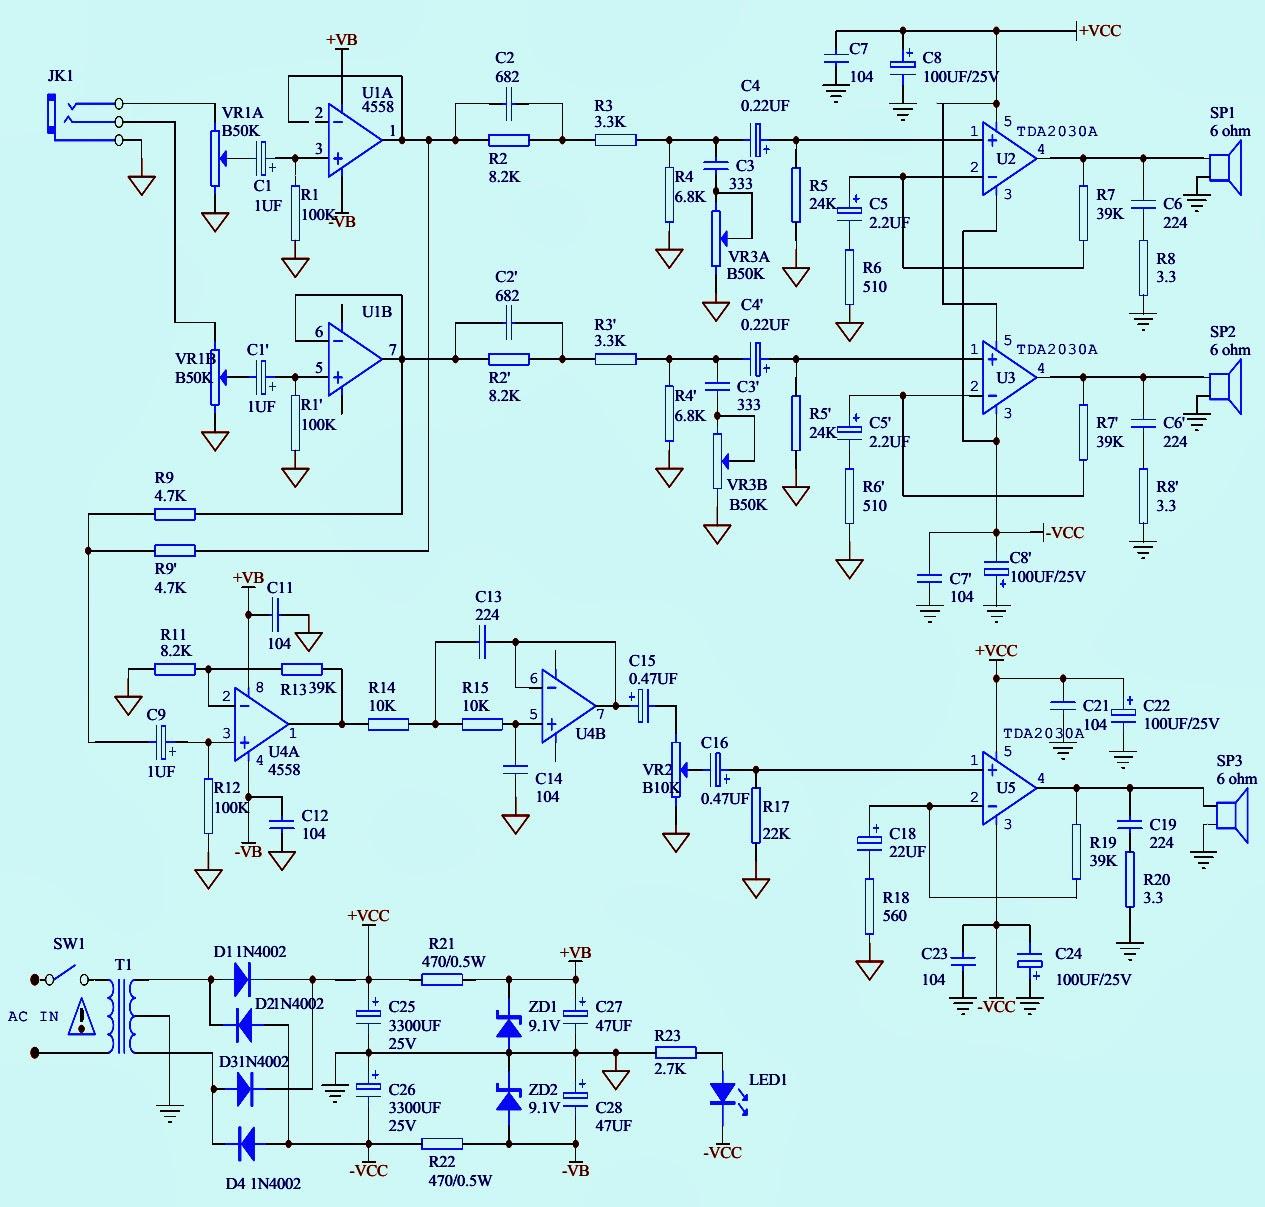 microlab m 280 circuit diagram trusted wiring diagrams u2022 rh tickets football co Microlab Science Microlab Science